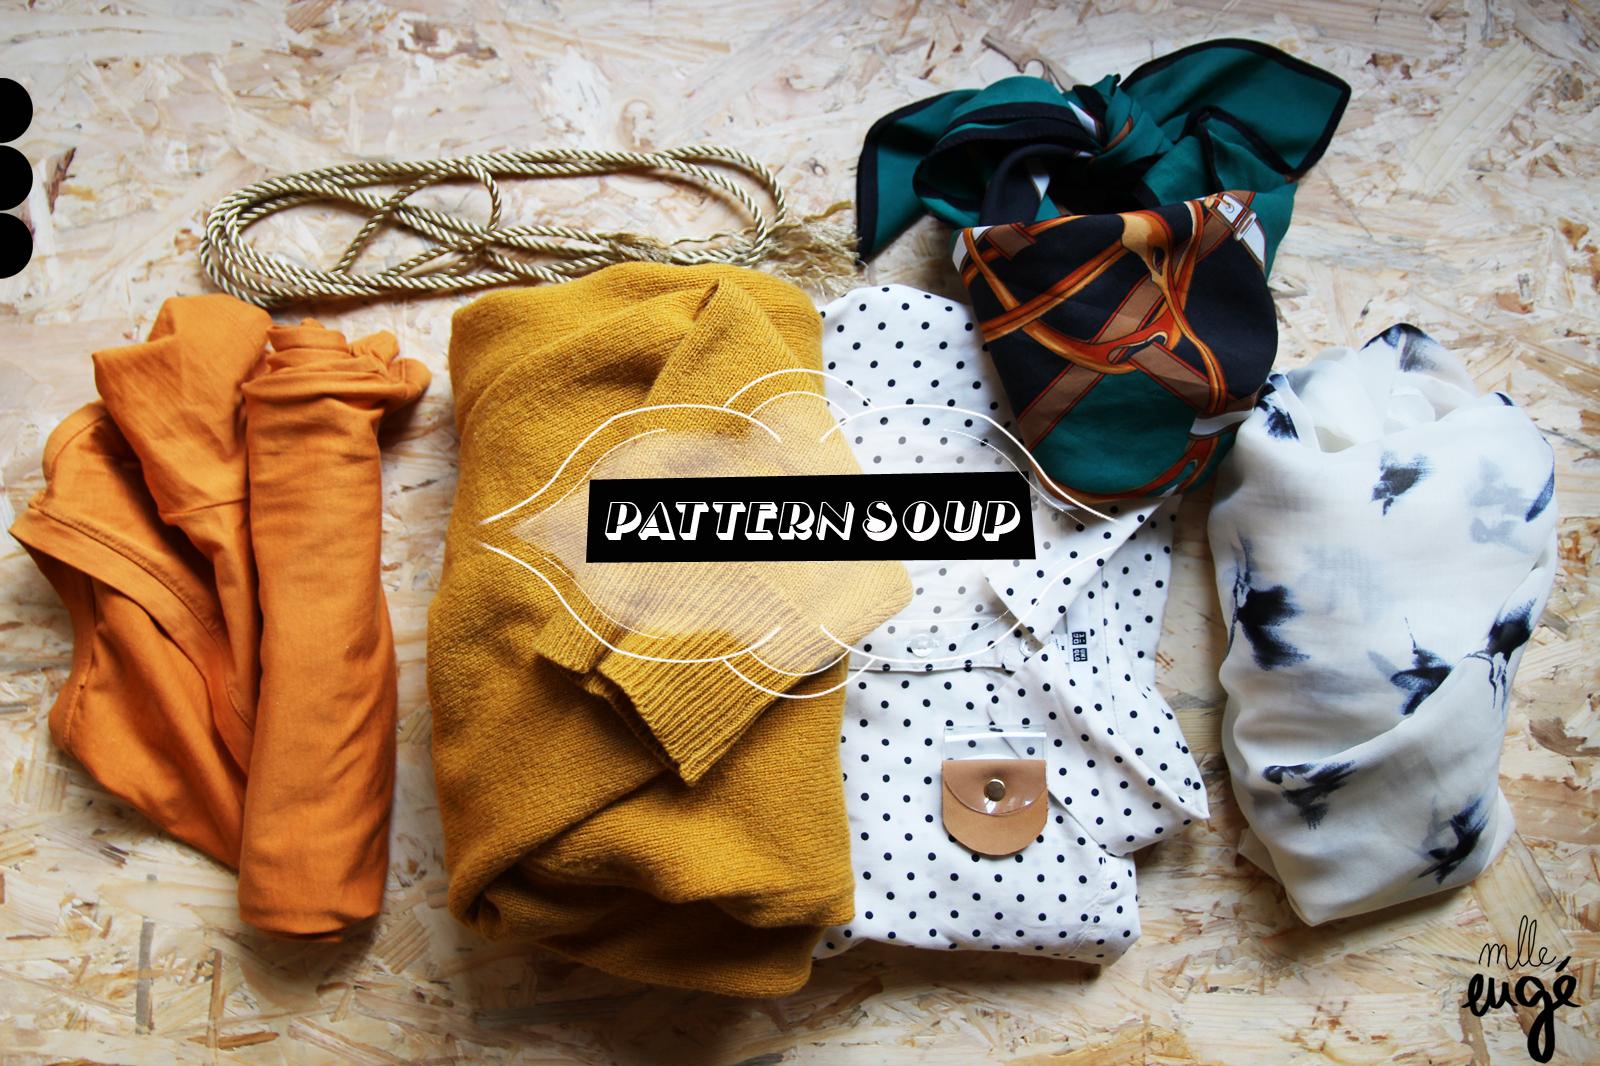 patternsoup_mademoiselleeuge.jpg